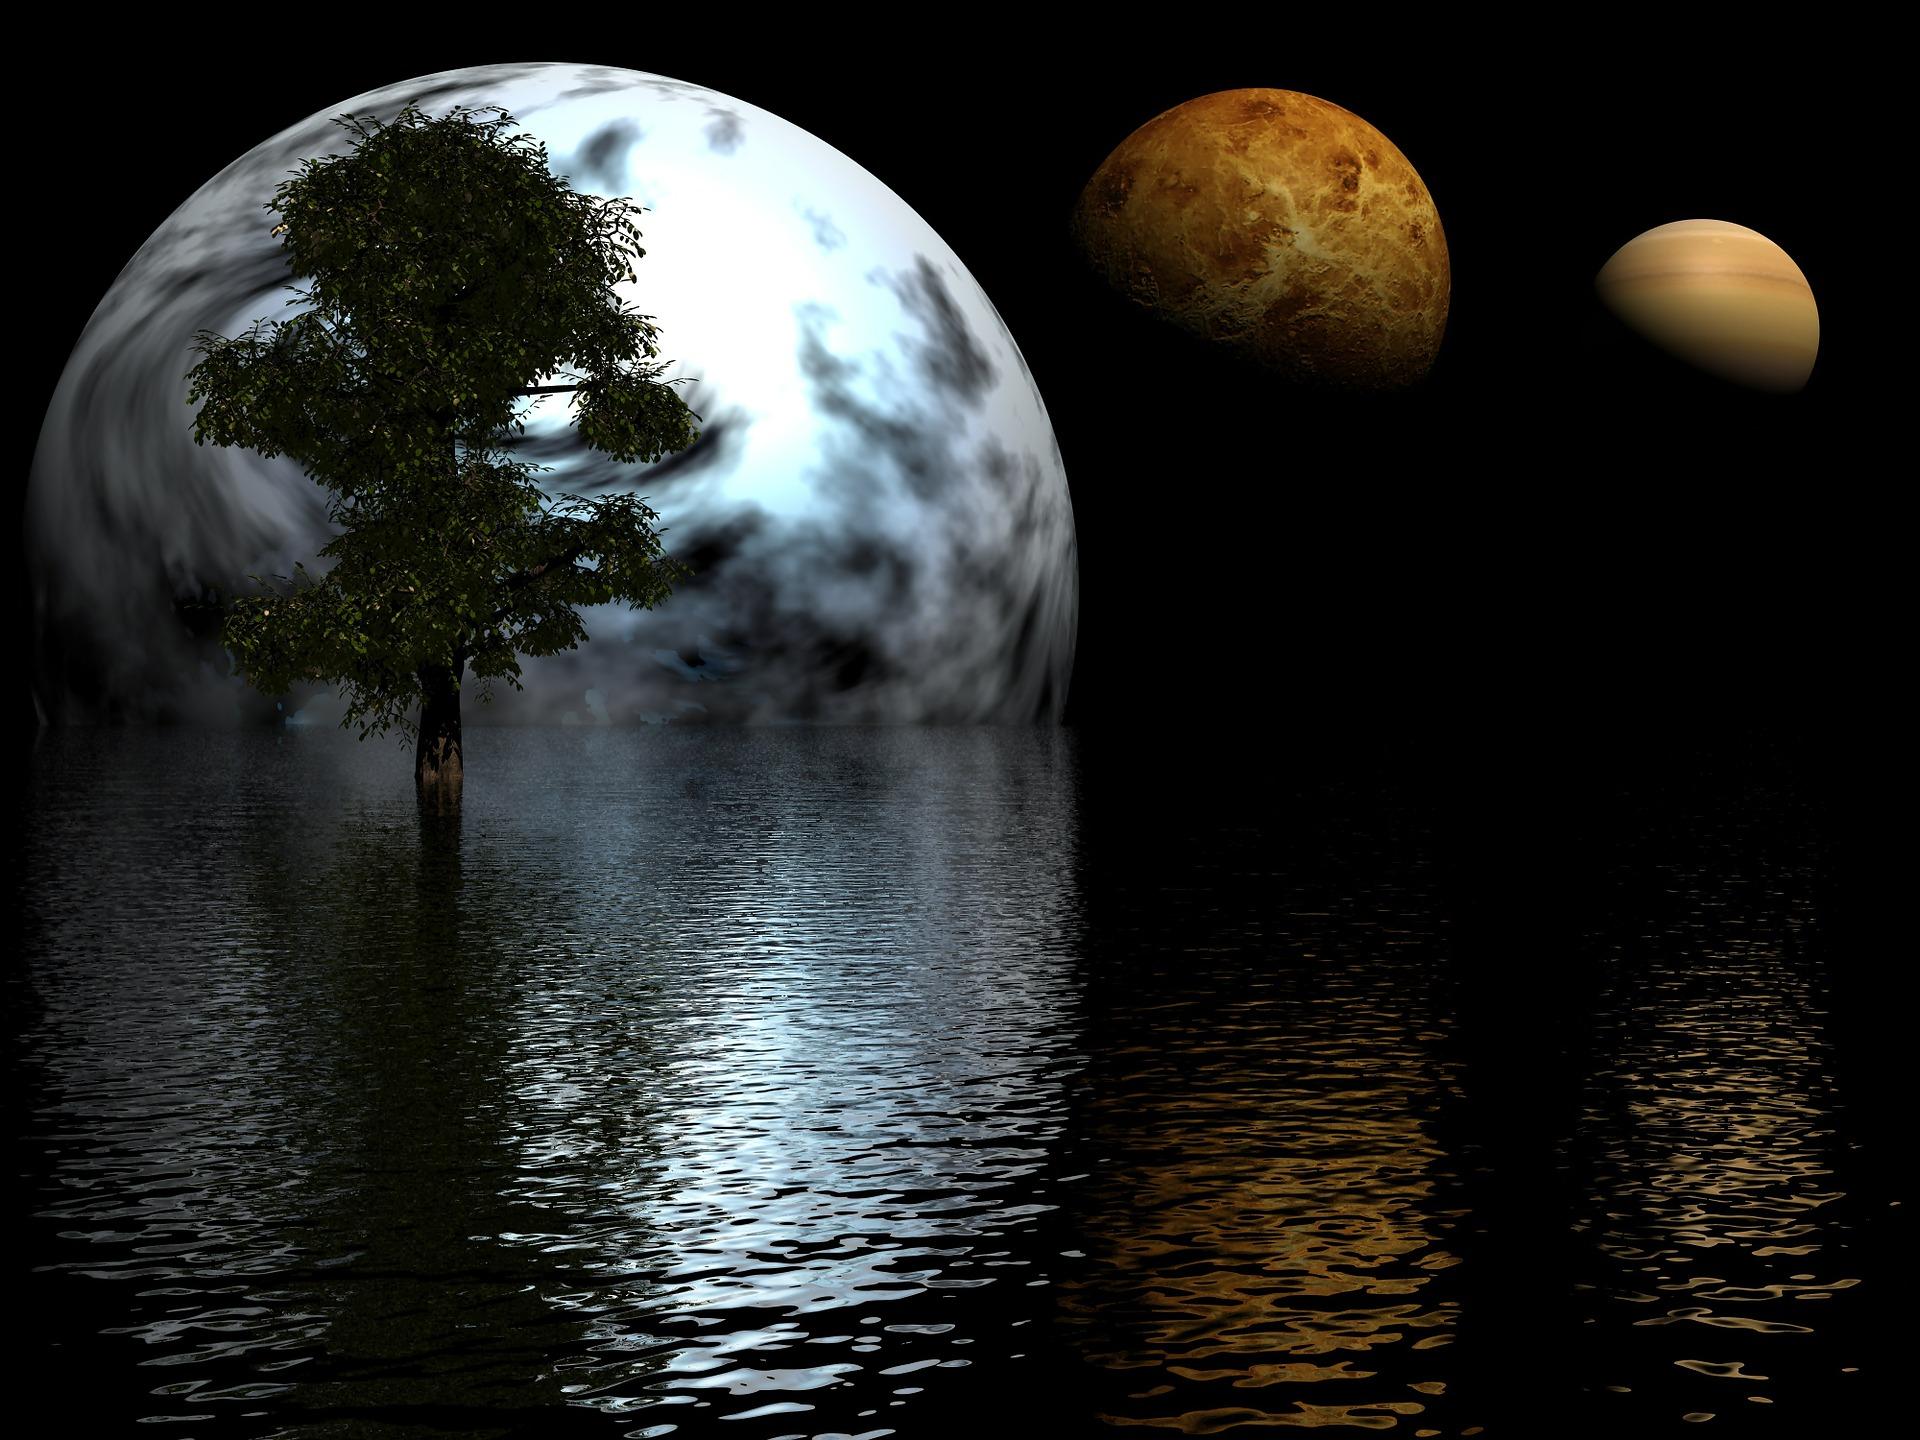 mercur a iesit din retrograd - sfatulparintilor.ro - pixabay_com - planets-482603_1920